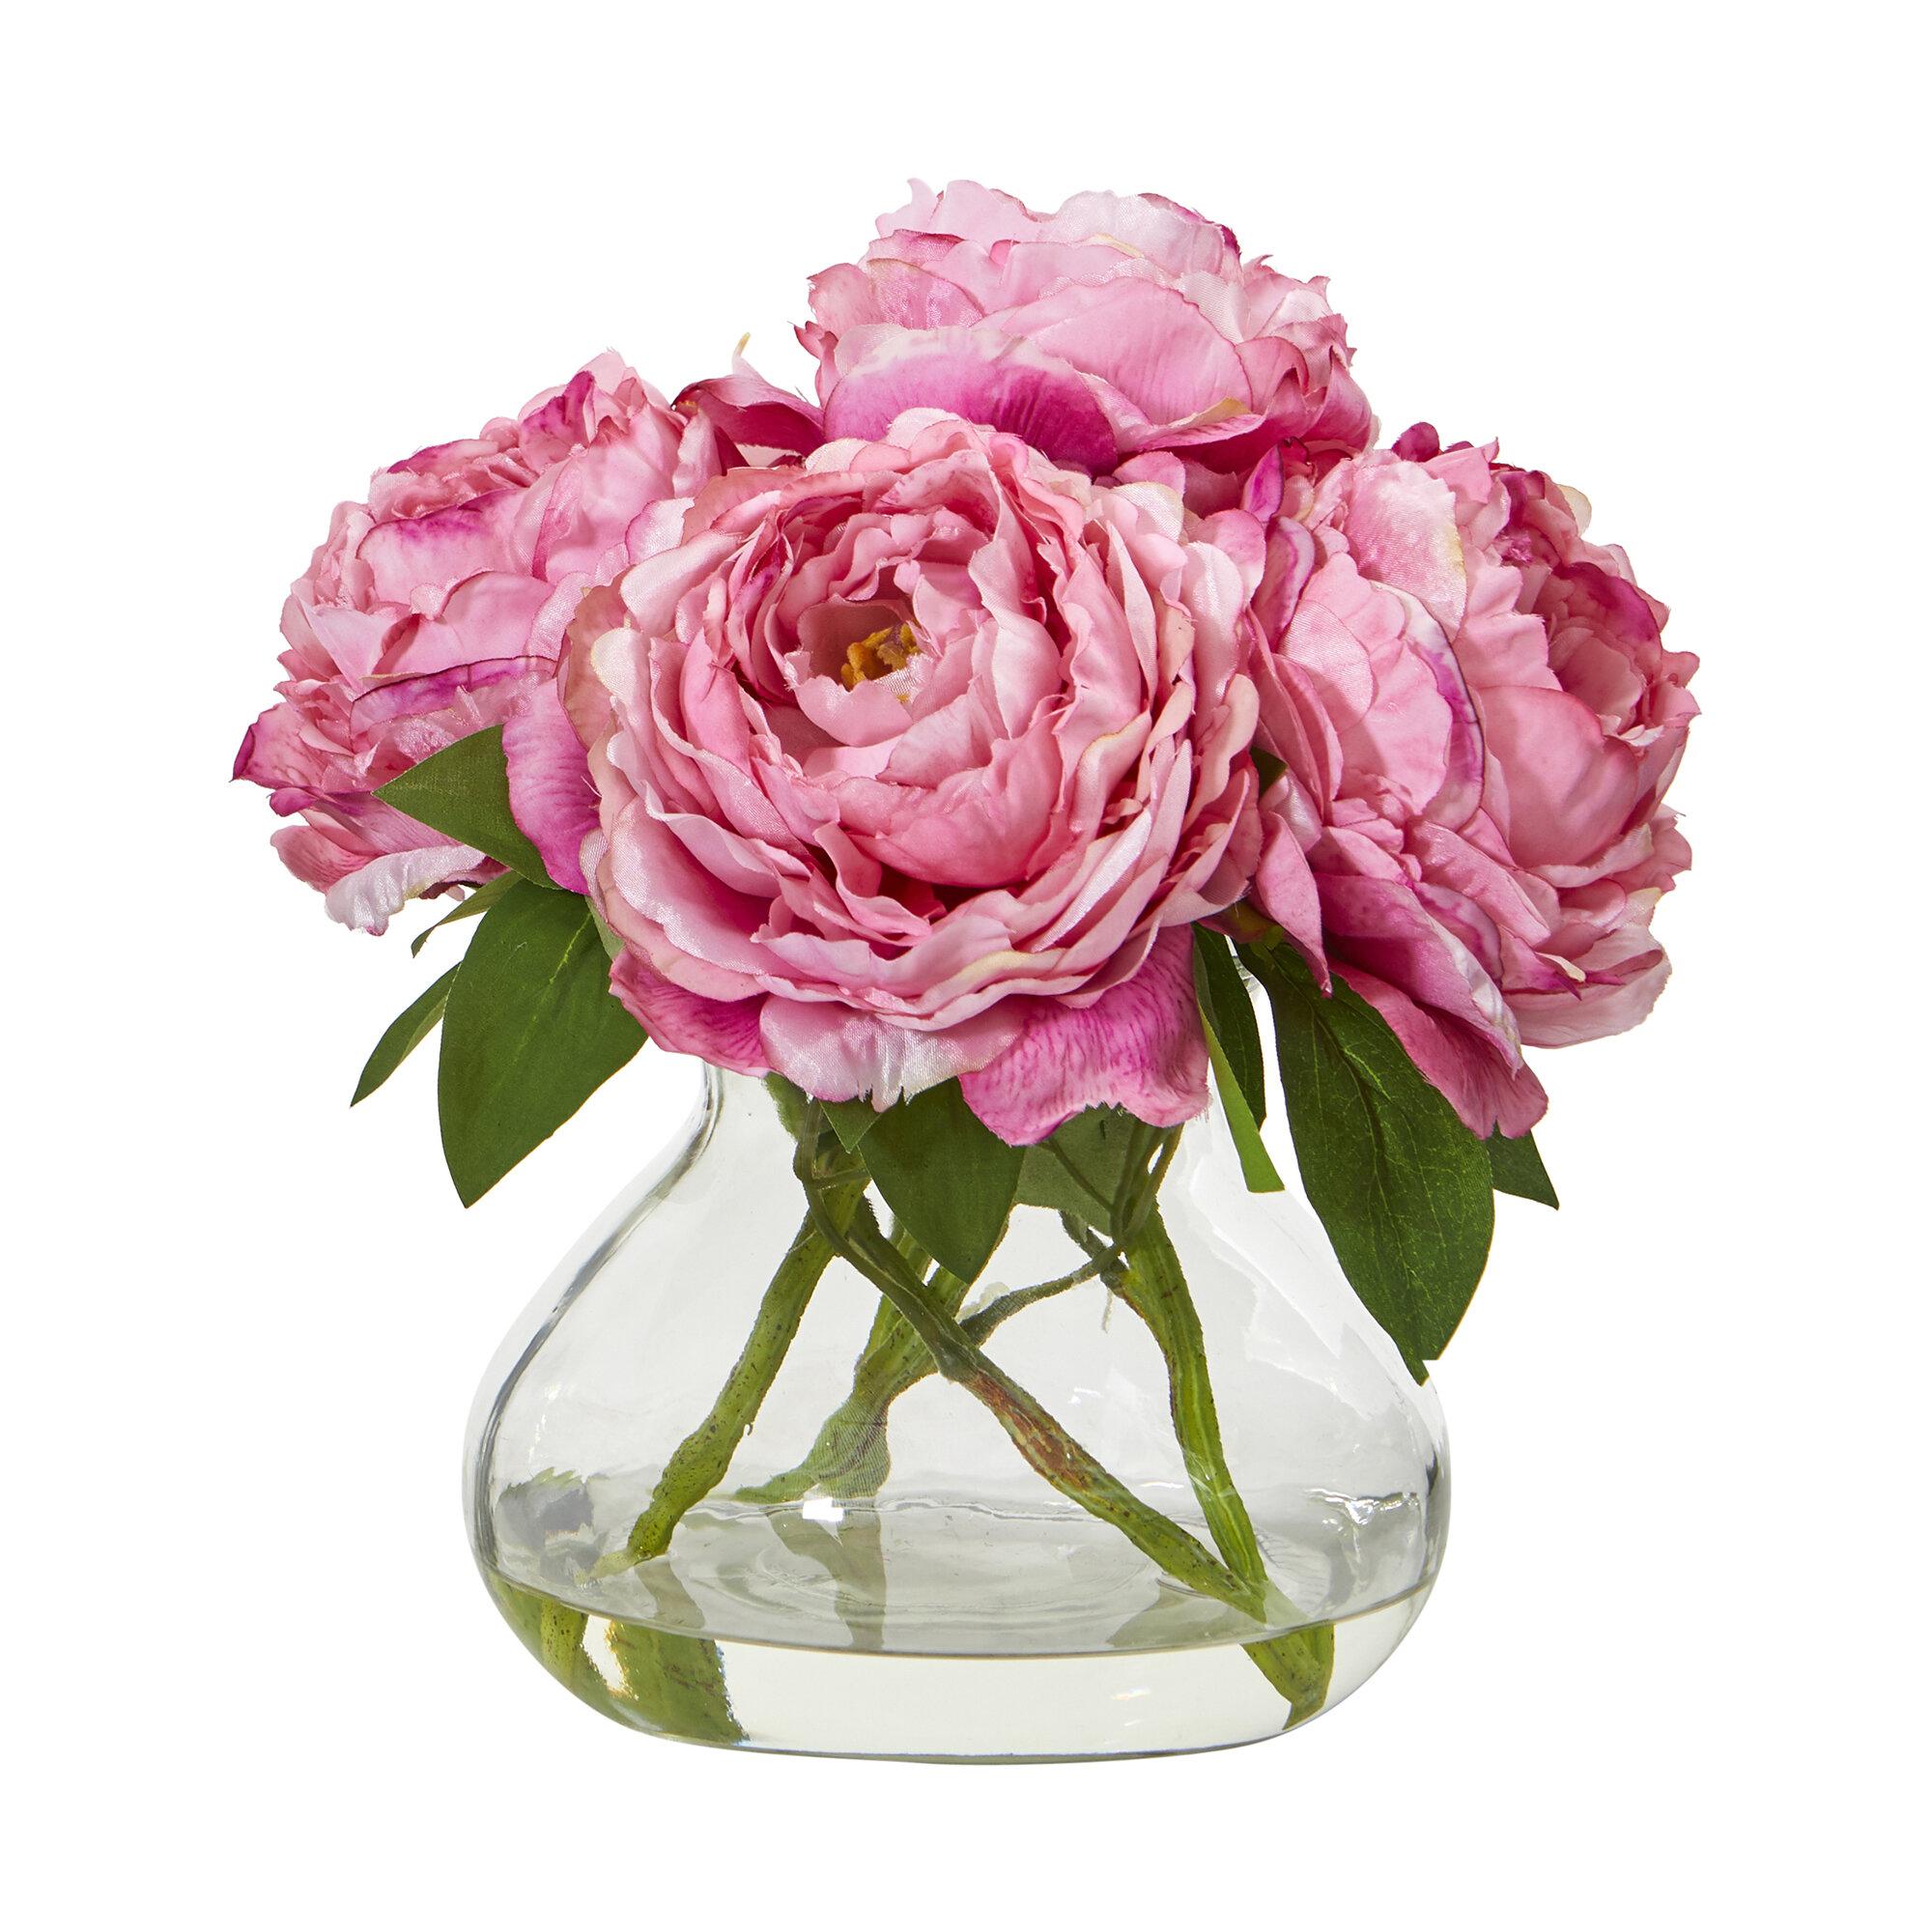 House Of Hampton Artificial Peonies Floral Arrangements In Vase Reviews Wayfair